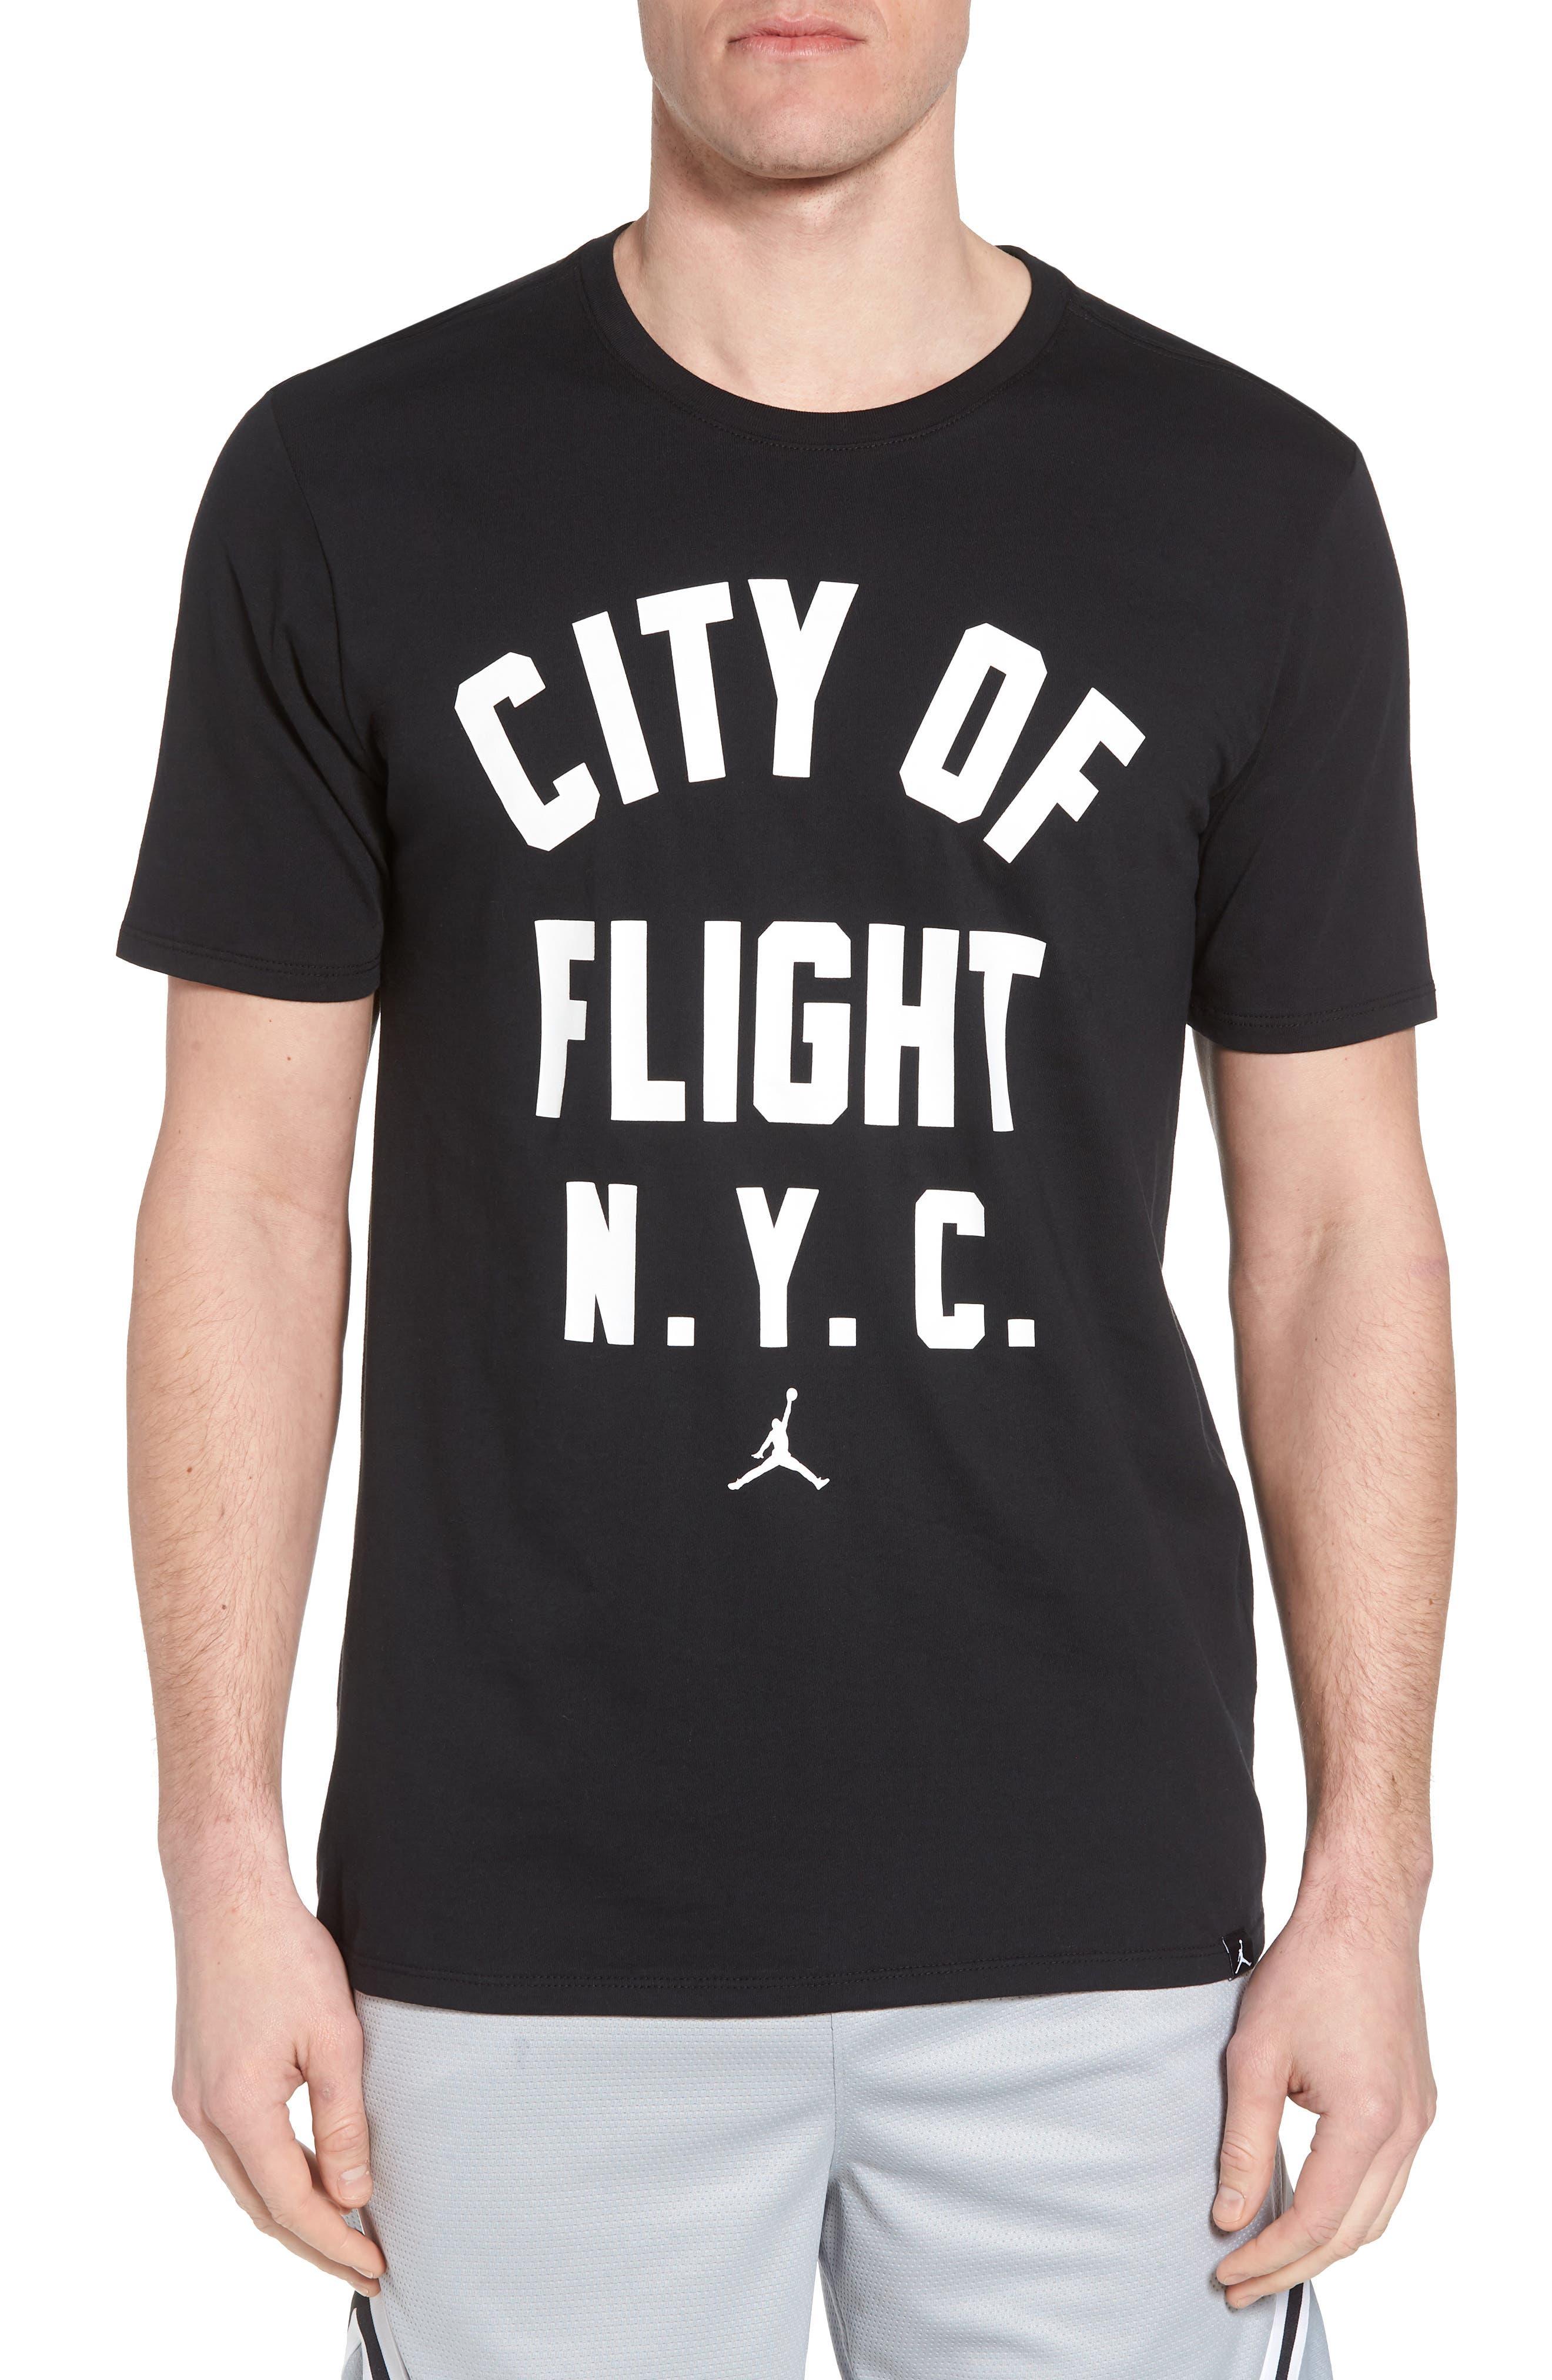 Sportswear City of Flight T-Shirt,                             Main thumbnail 1, color,                             Black/ White